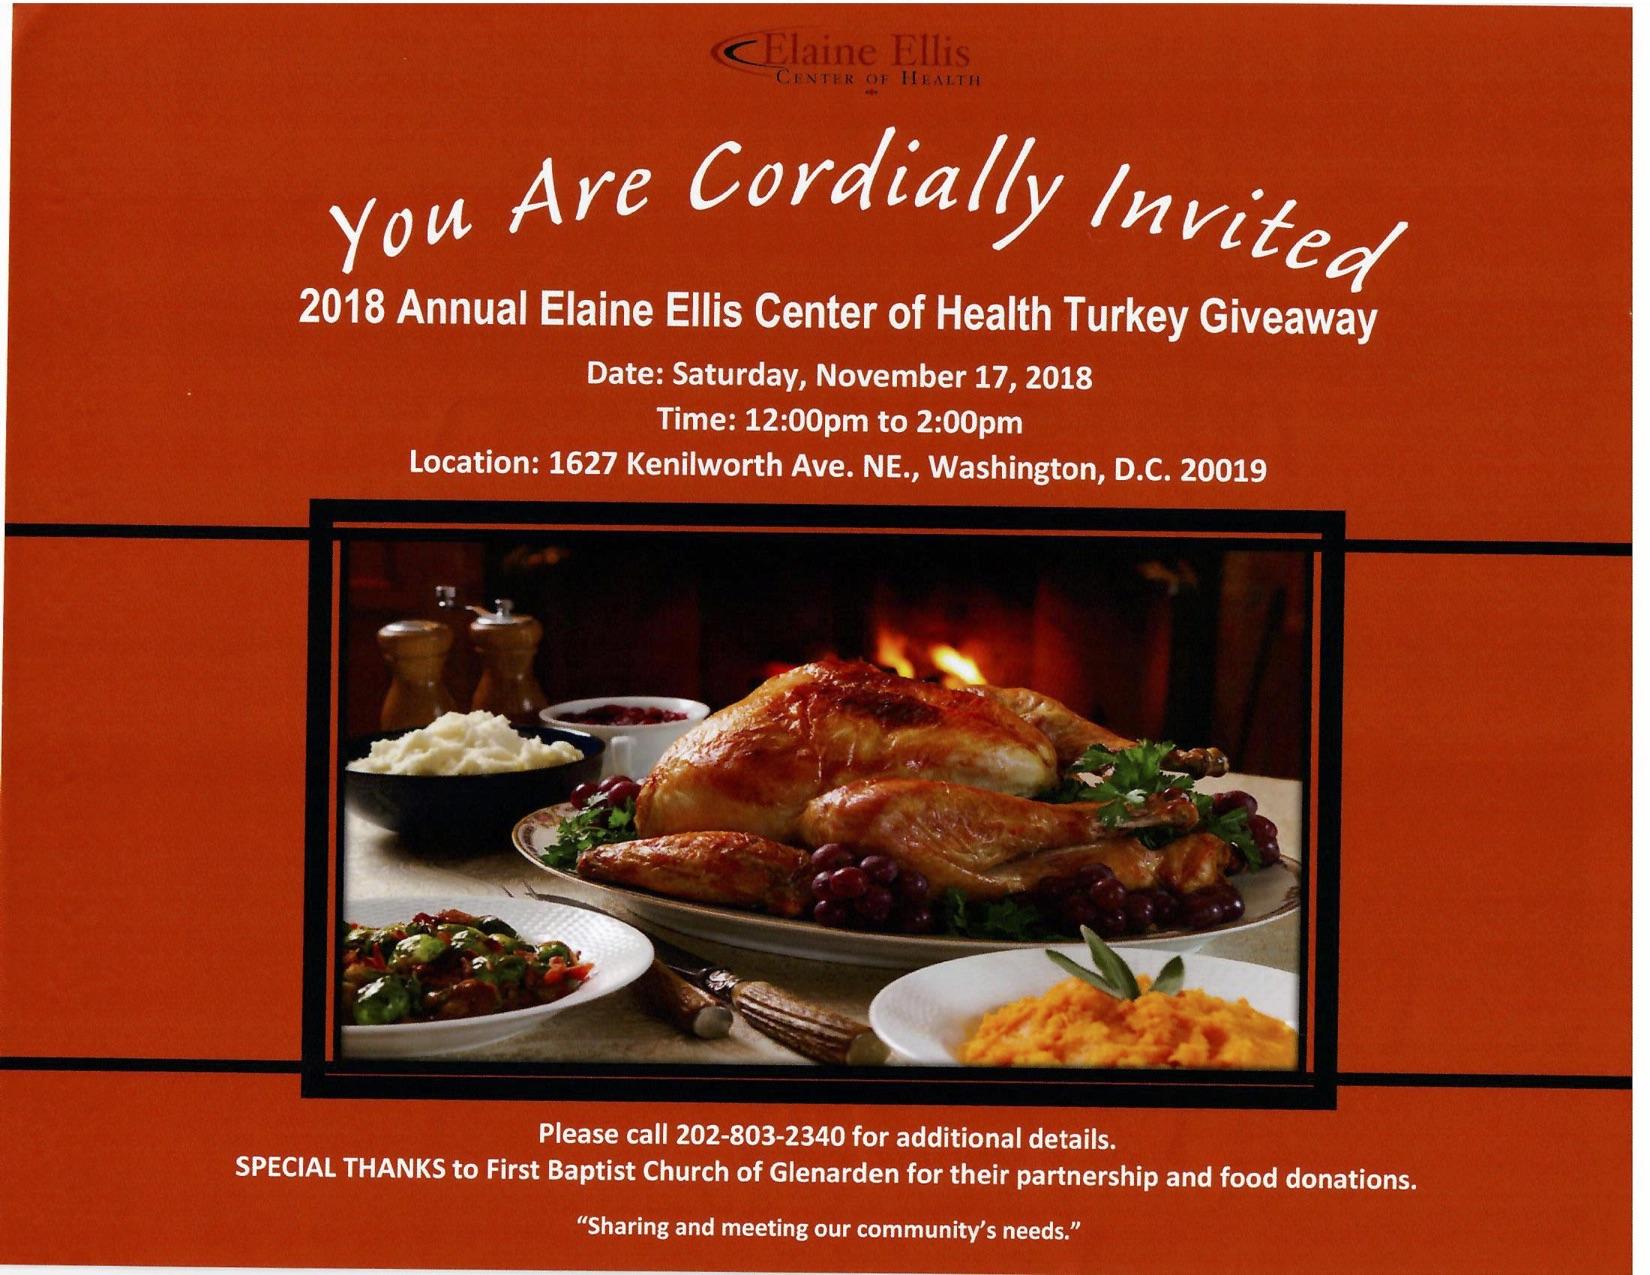 Elaine Ellis Center of Health Turkey Giveaway